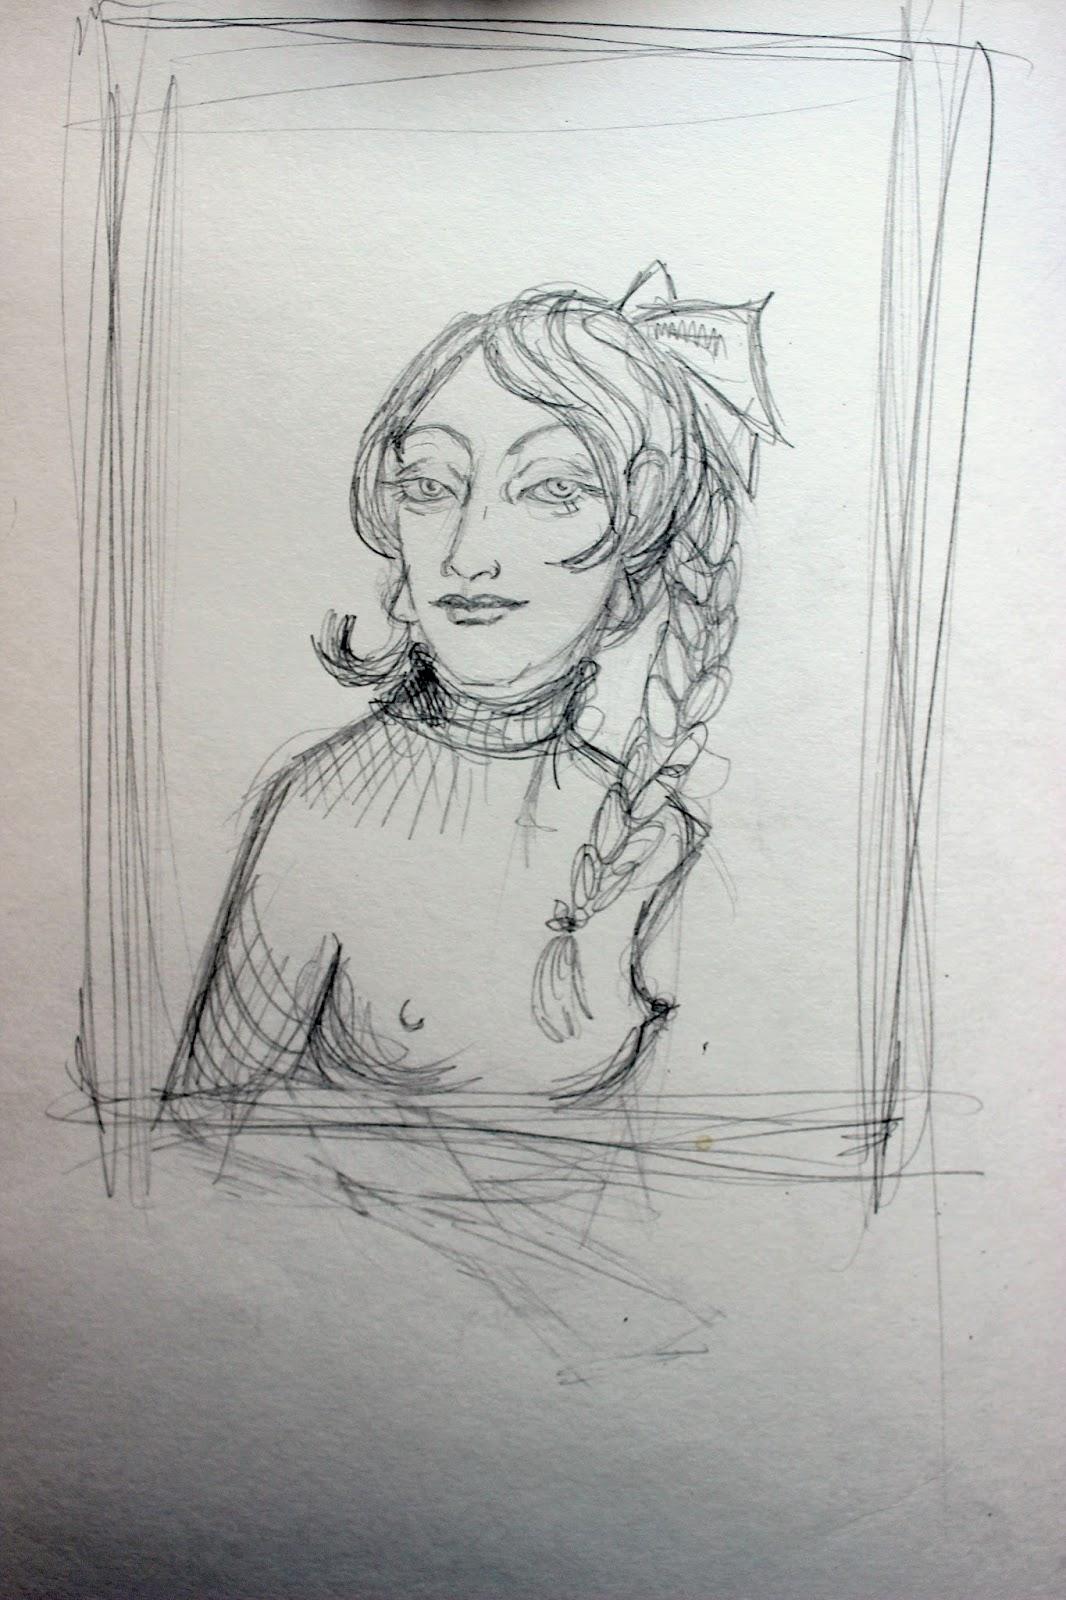 Sketchpad Notebook Sketch Drawing Pencil Portrait Girl Nipples